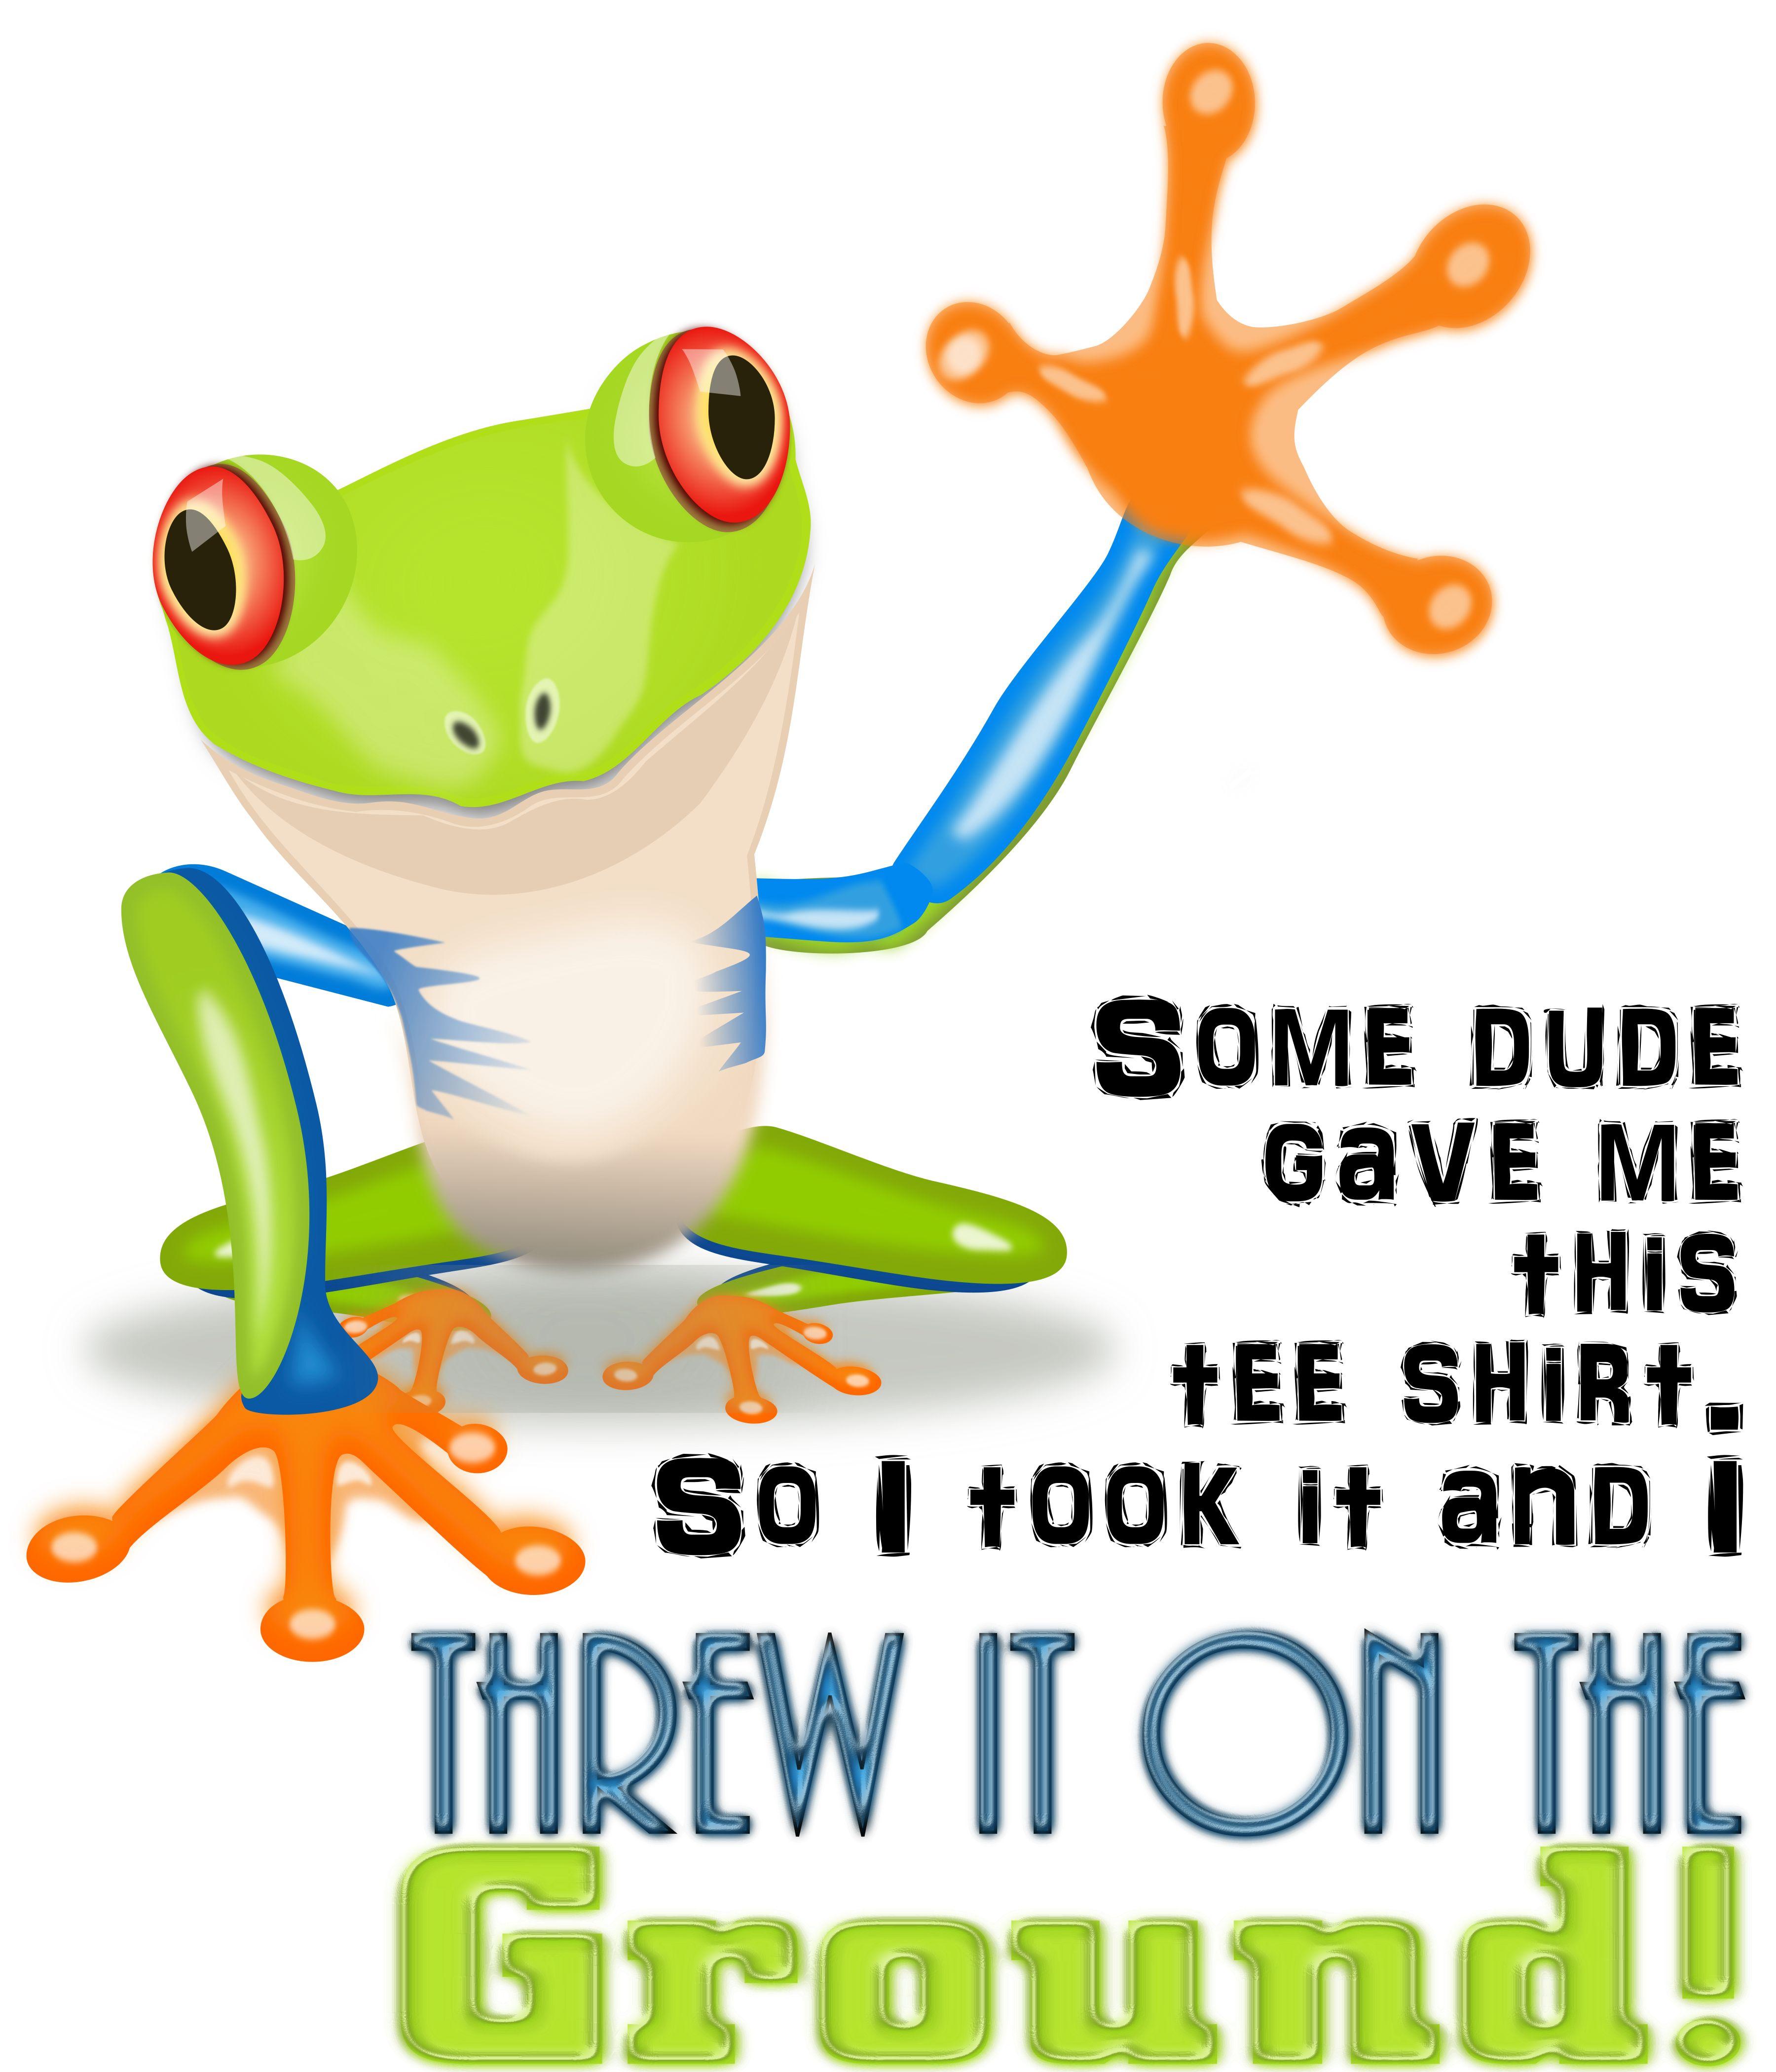 threw-it